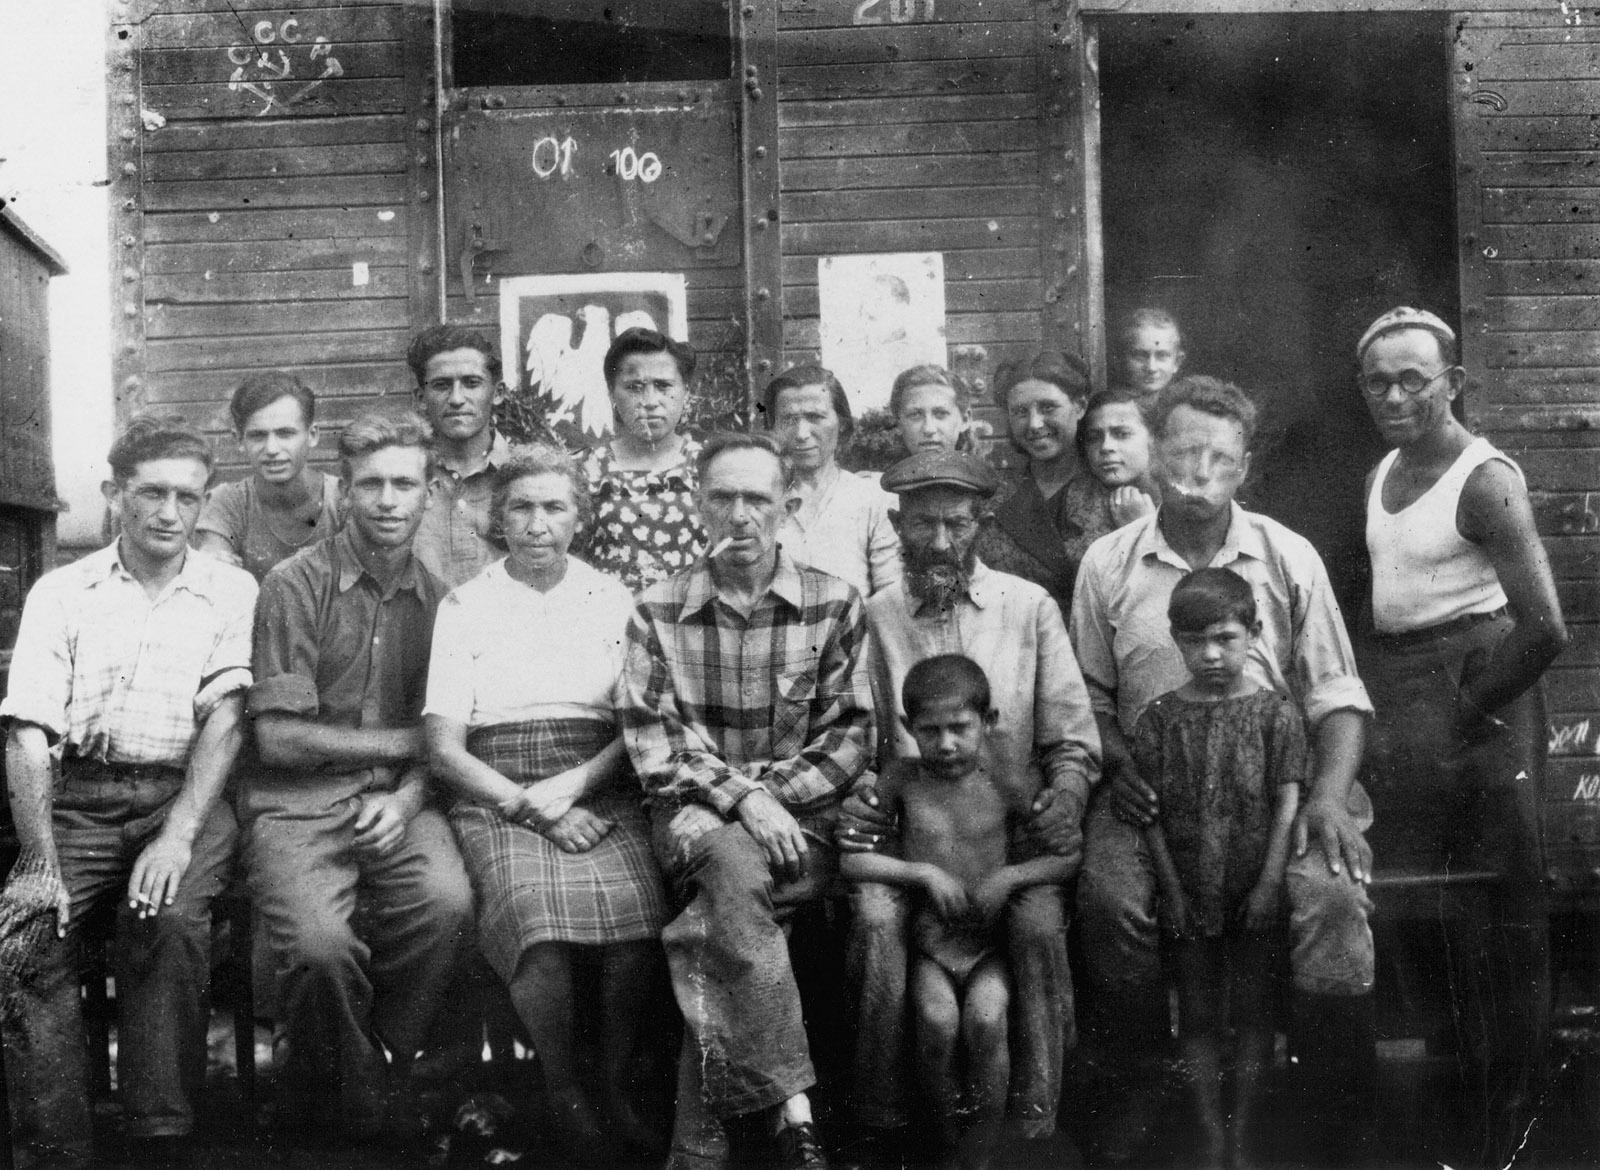 Polish Jews waiting to board a repatriation train, Kazakhstan